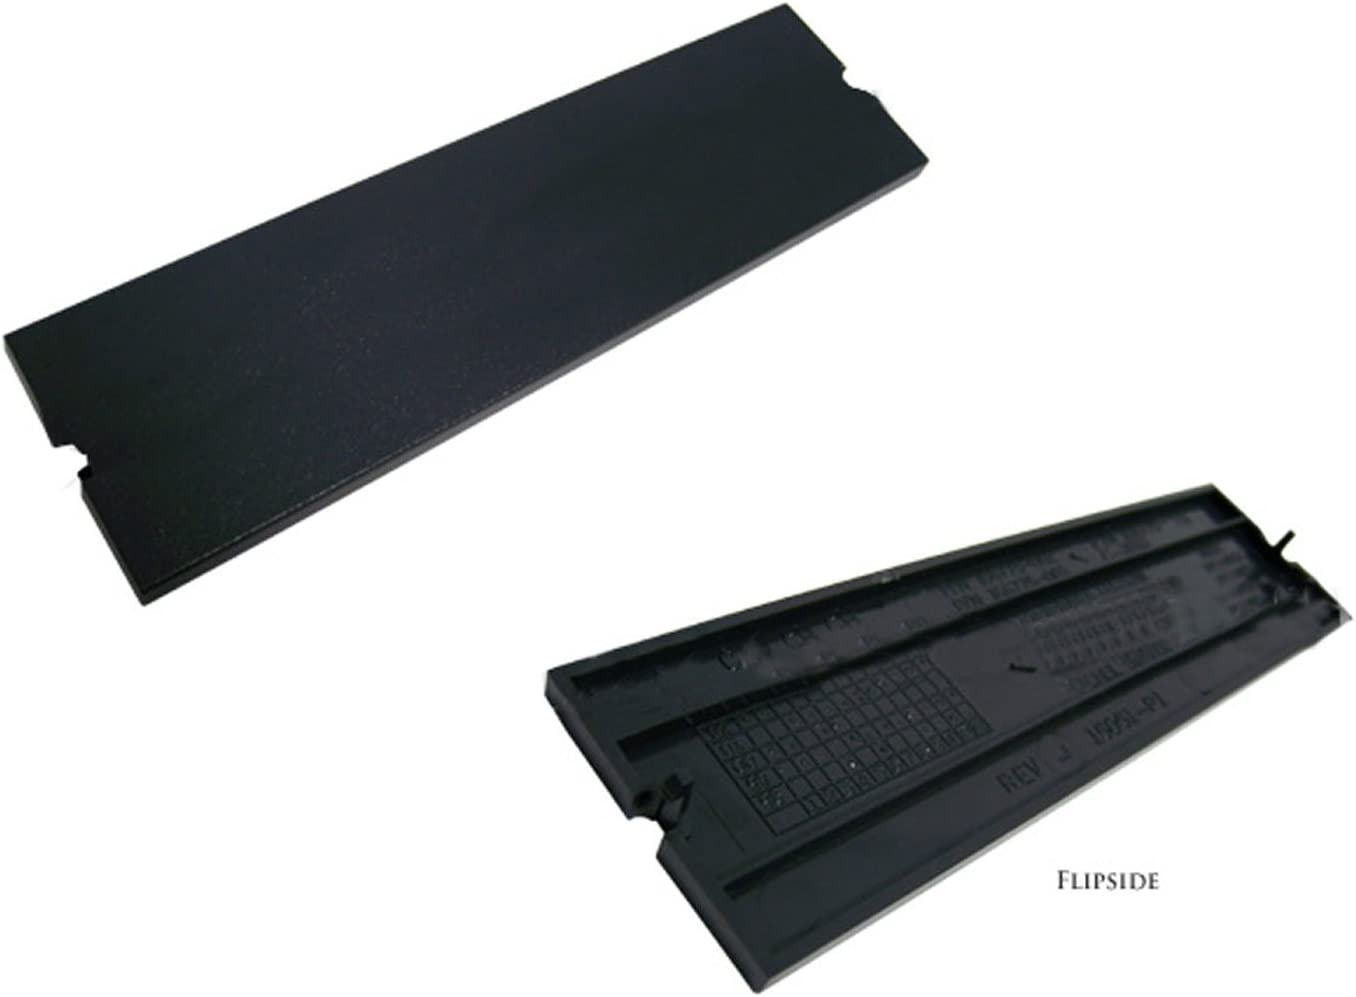 Genuine HP Compaq DC7600 Desktop Bay Blank Carbon Bezel 166775-001